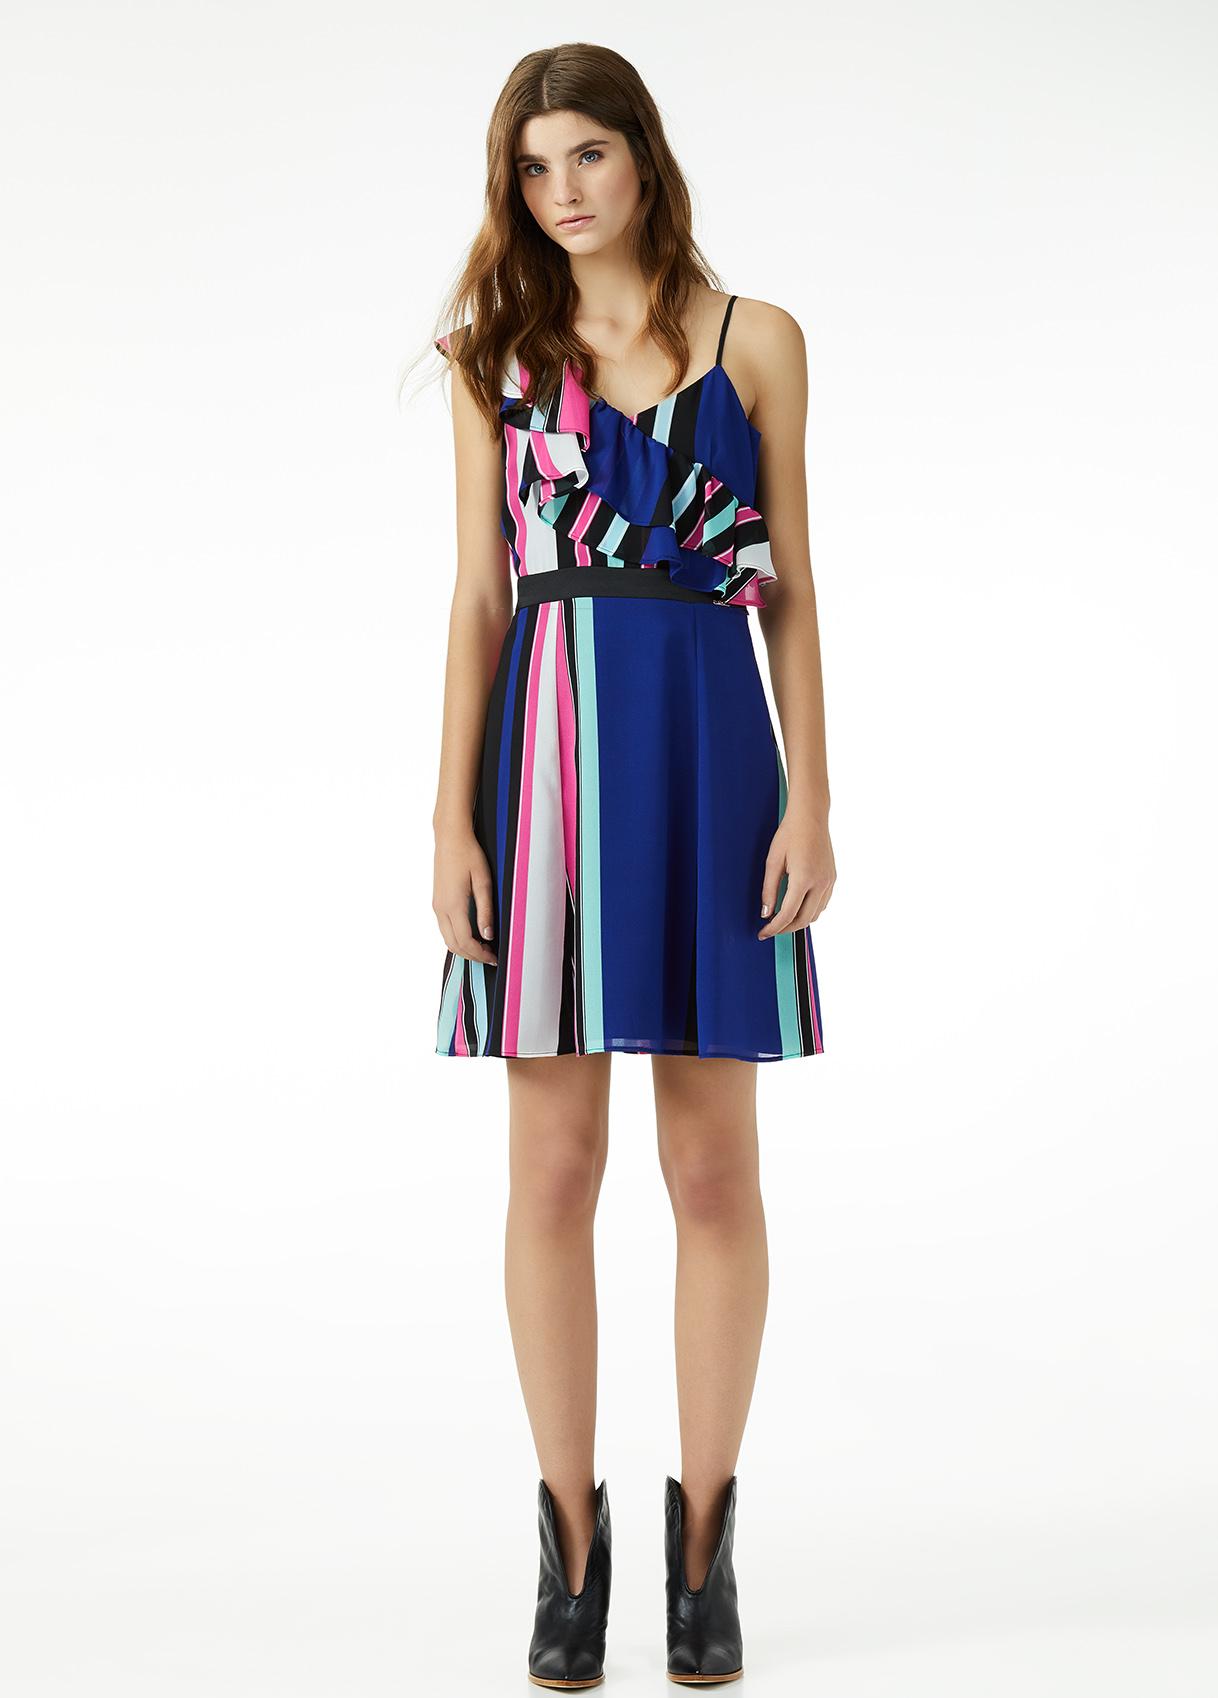 8059599966756-Dresses-Shortdresses-I19237T2235V9877-I-AO-N-B-03-R